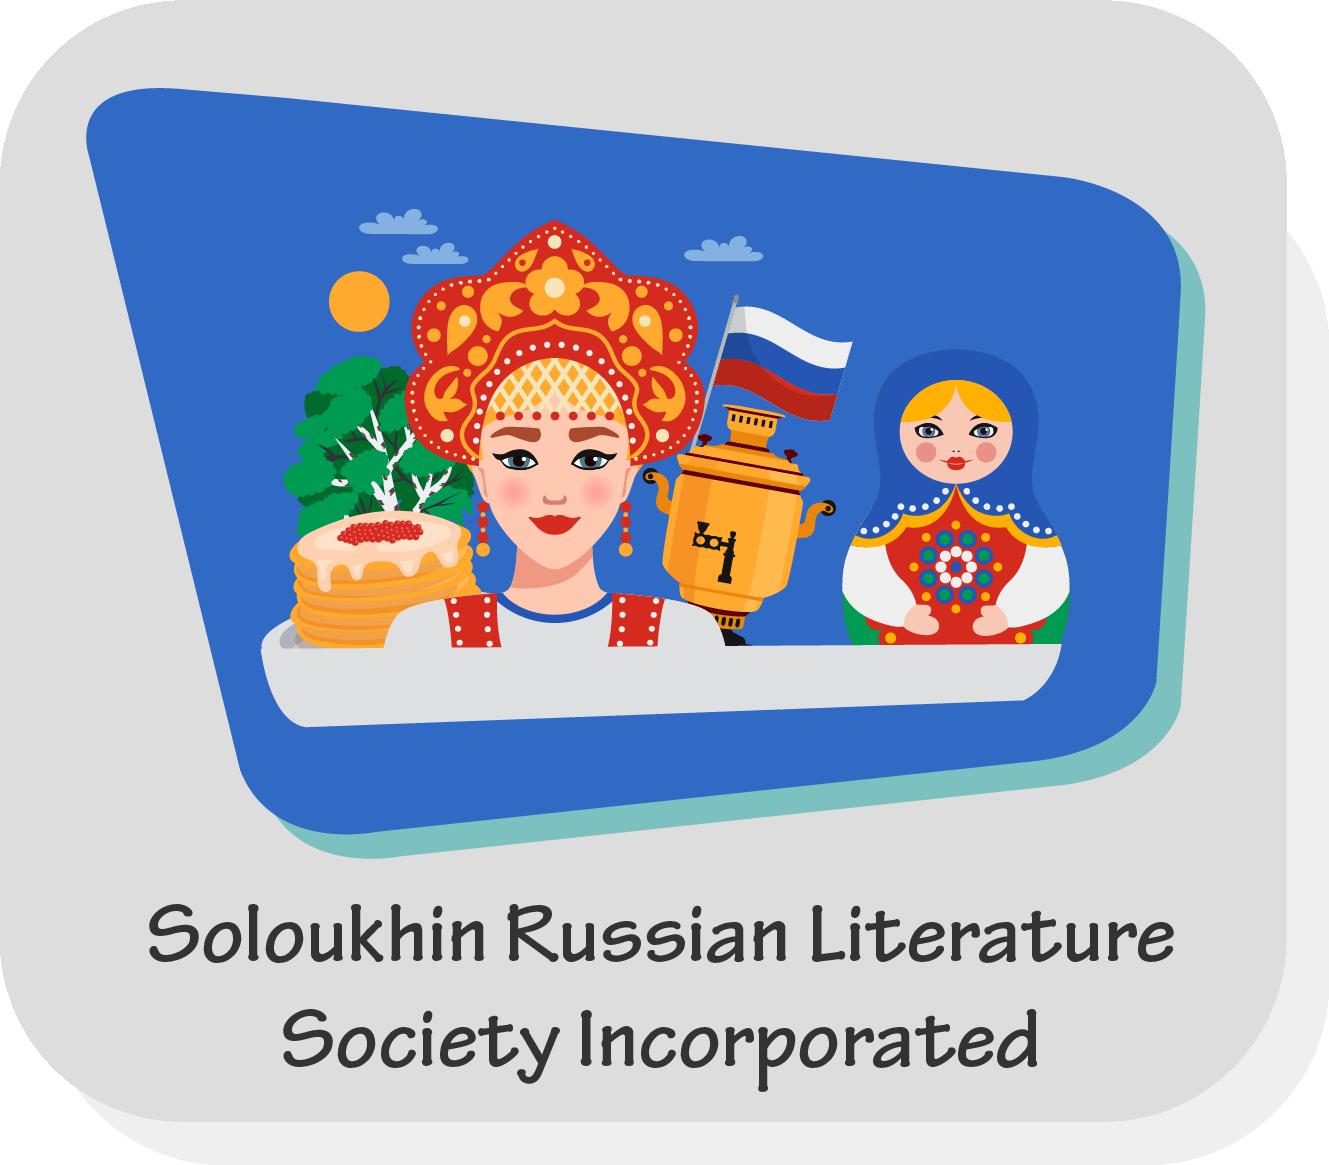 The Soloukhin Russian Literature Society